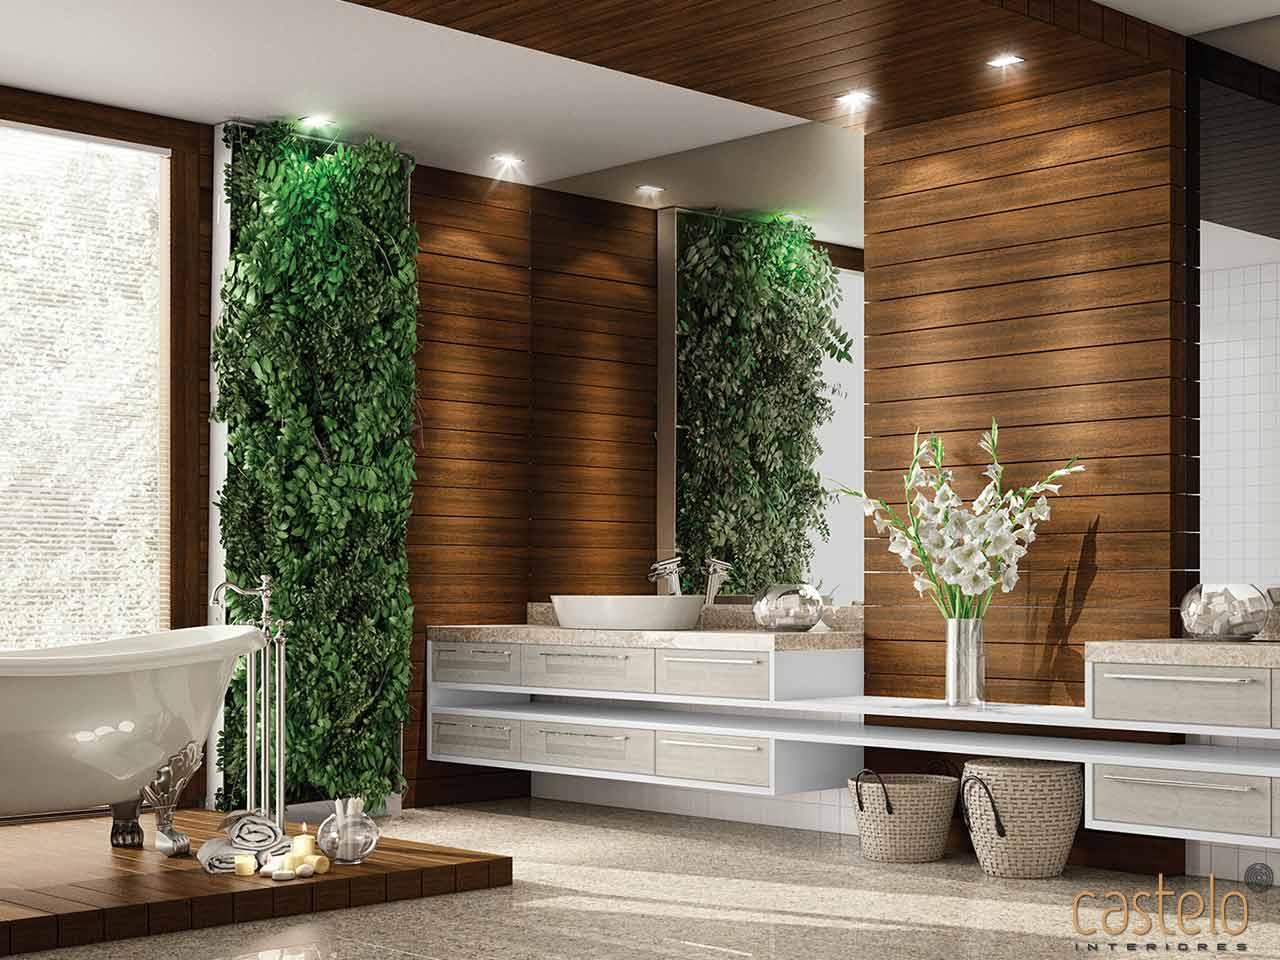 castelo-interiores-banheiro2